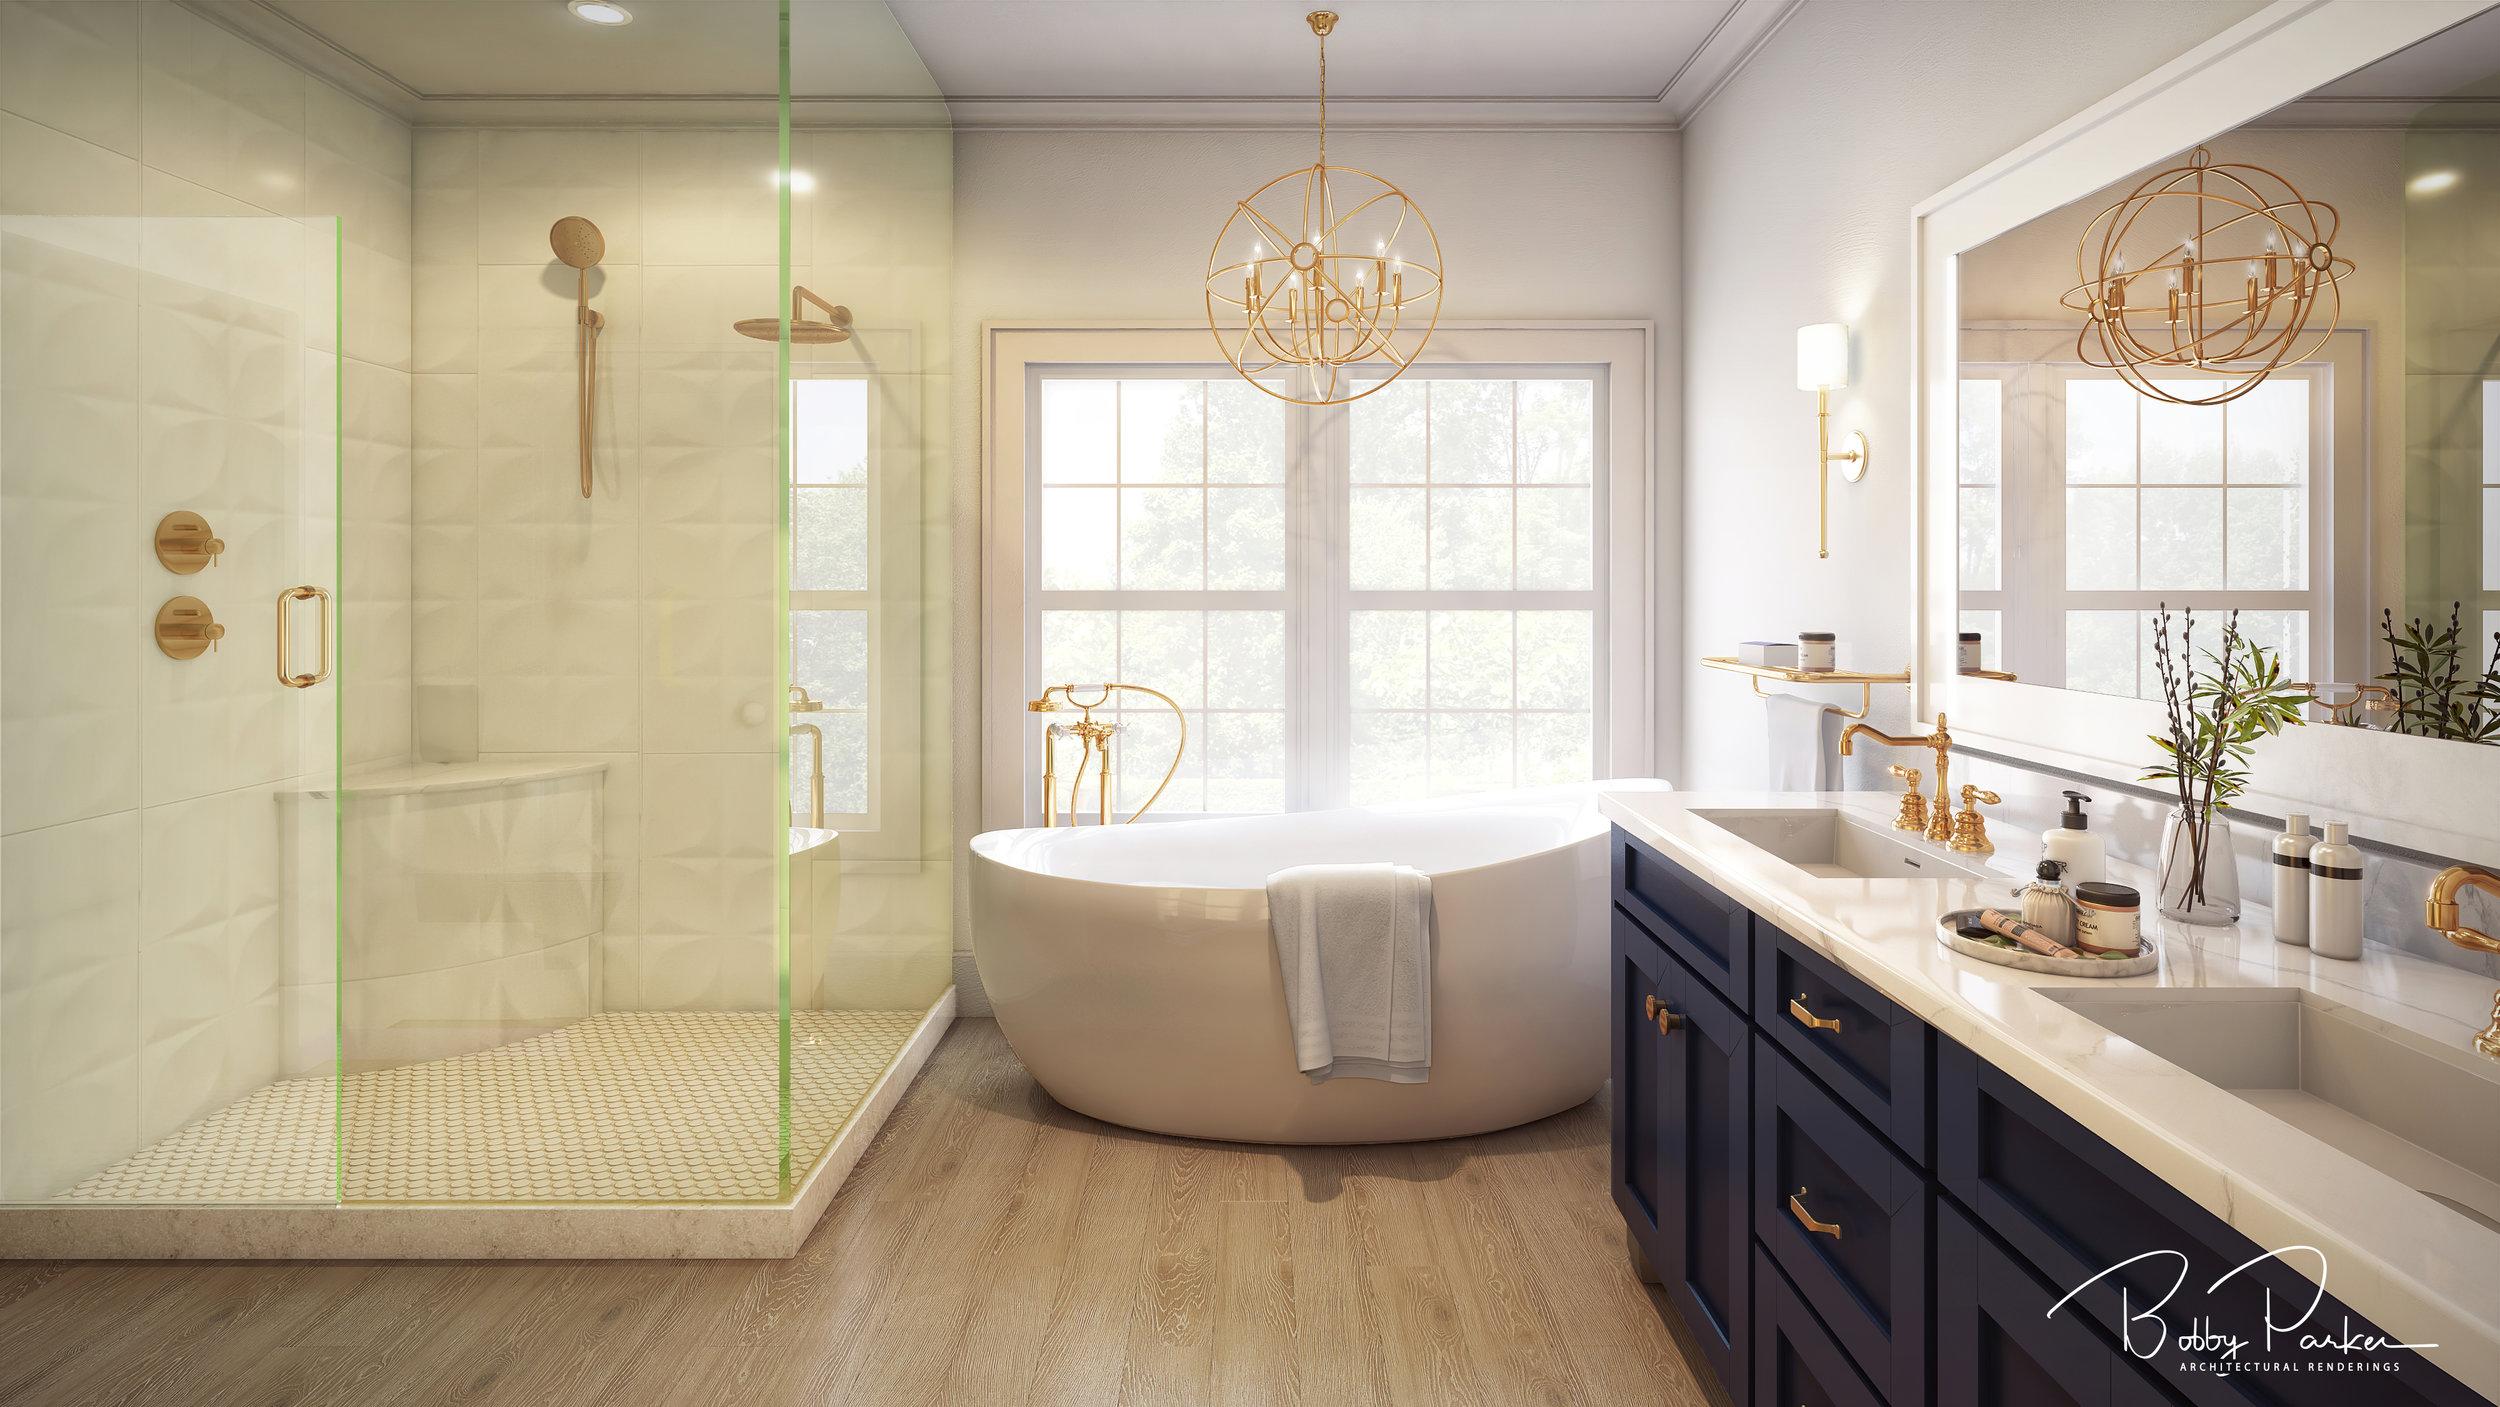 725-Brookside_Bathroom-High-Resolution.jpg